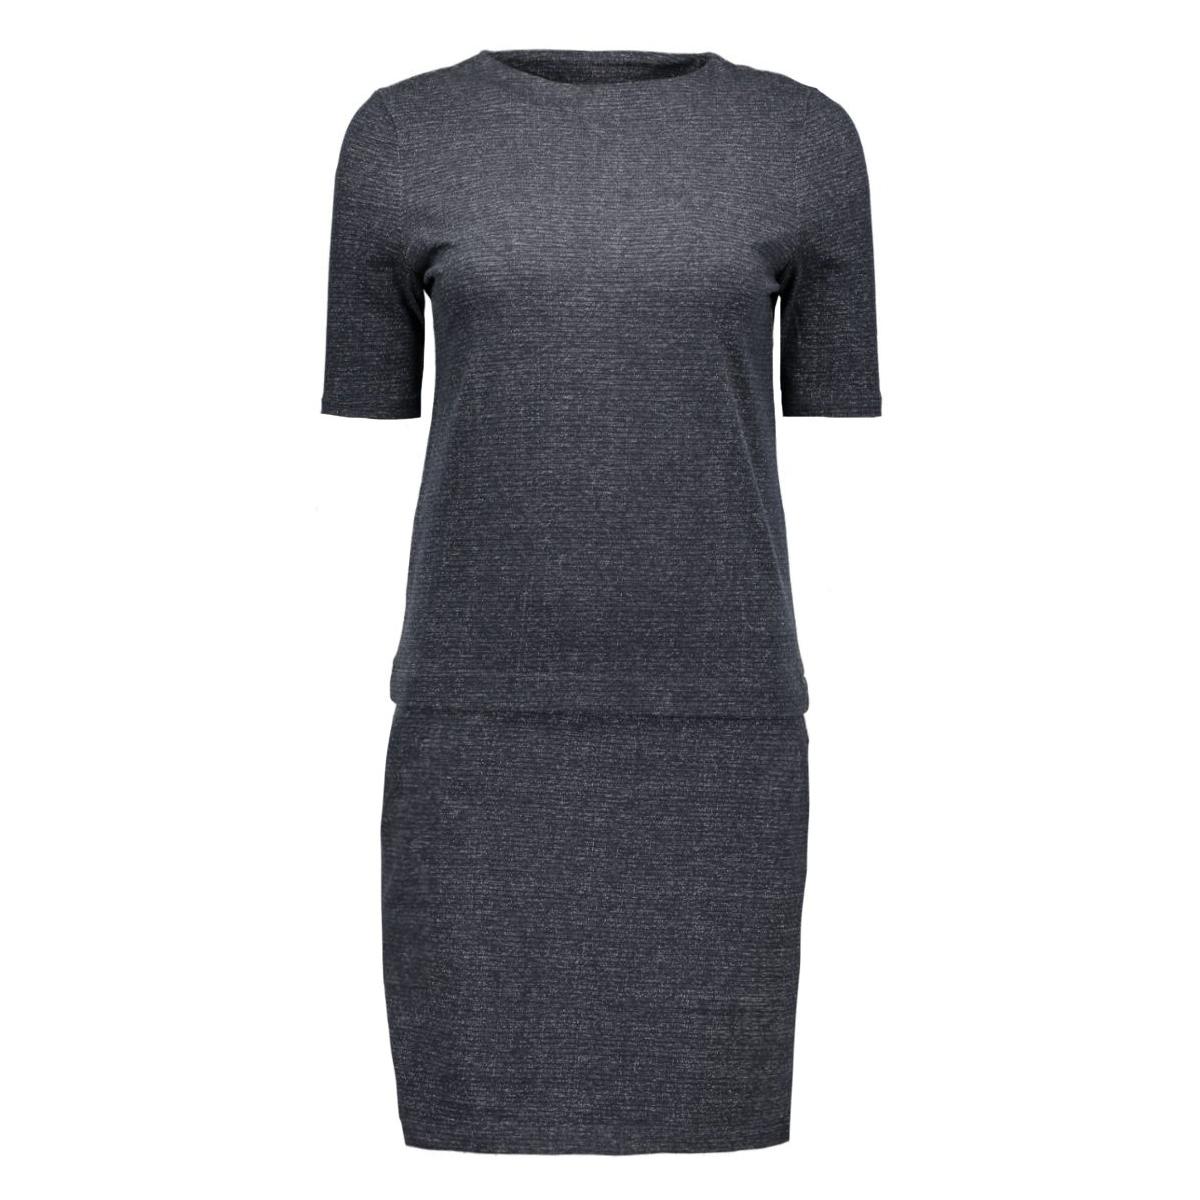 objdobbi 3/4 dress 23022814 object jurk anthracite